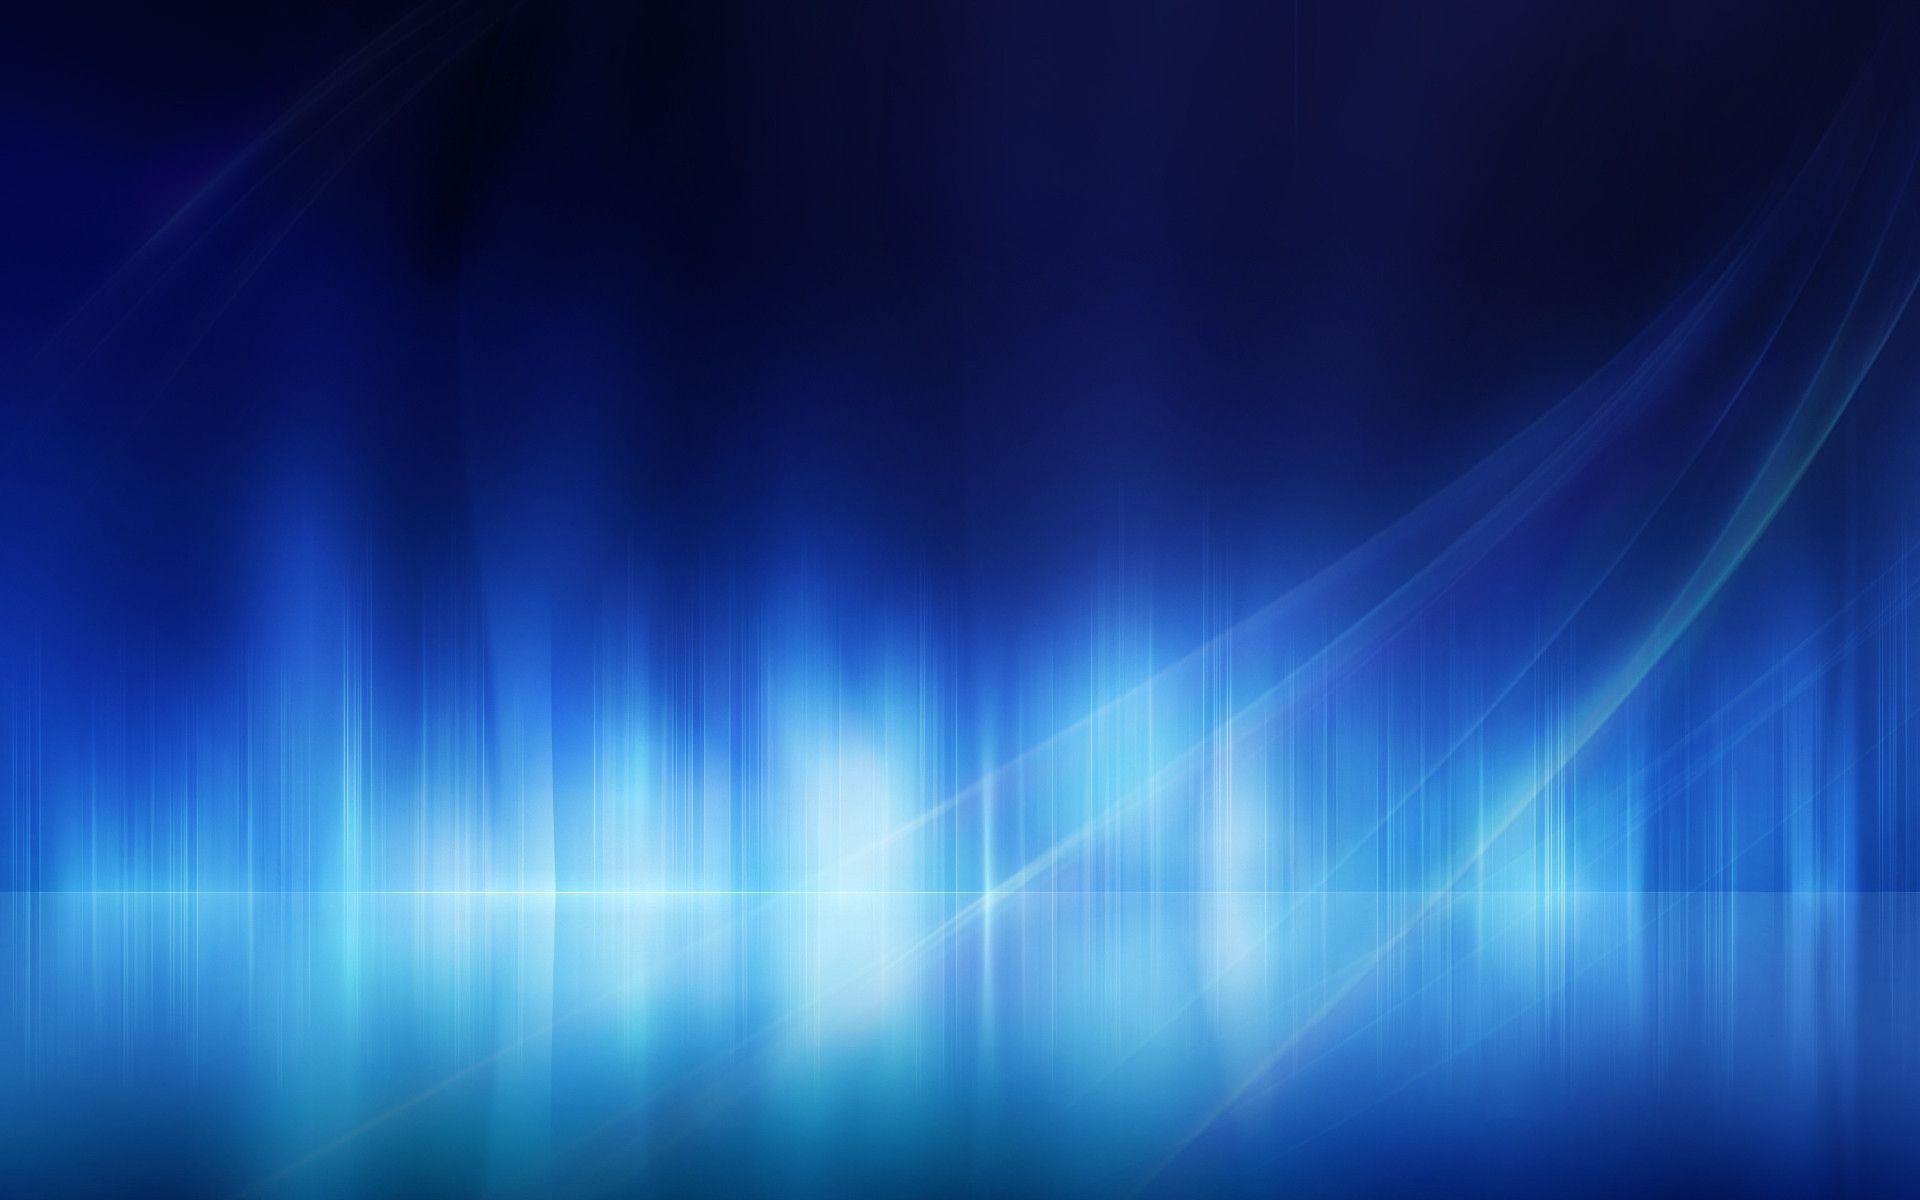 Plain Blue Backgrounds Wallpapers - Wallpaper Cave